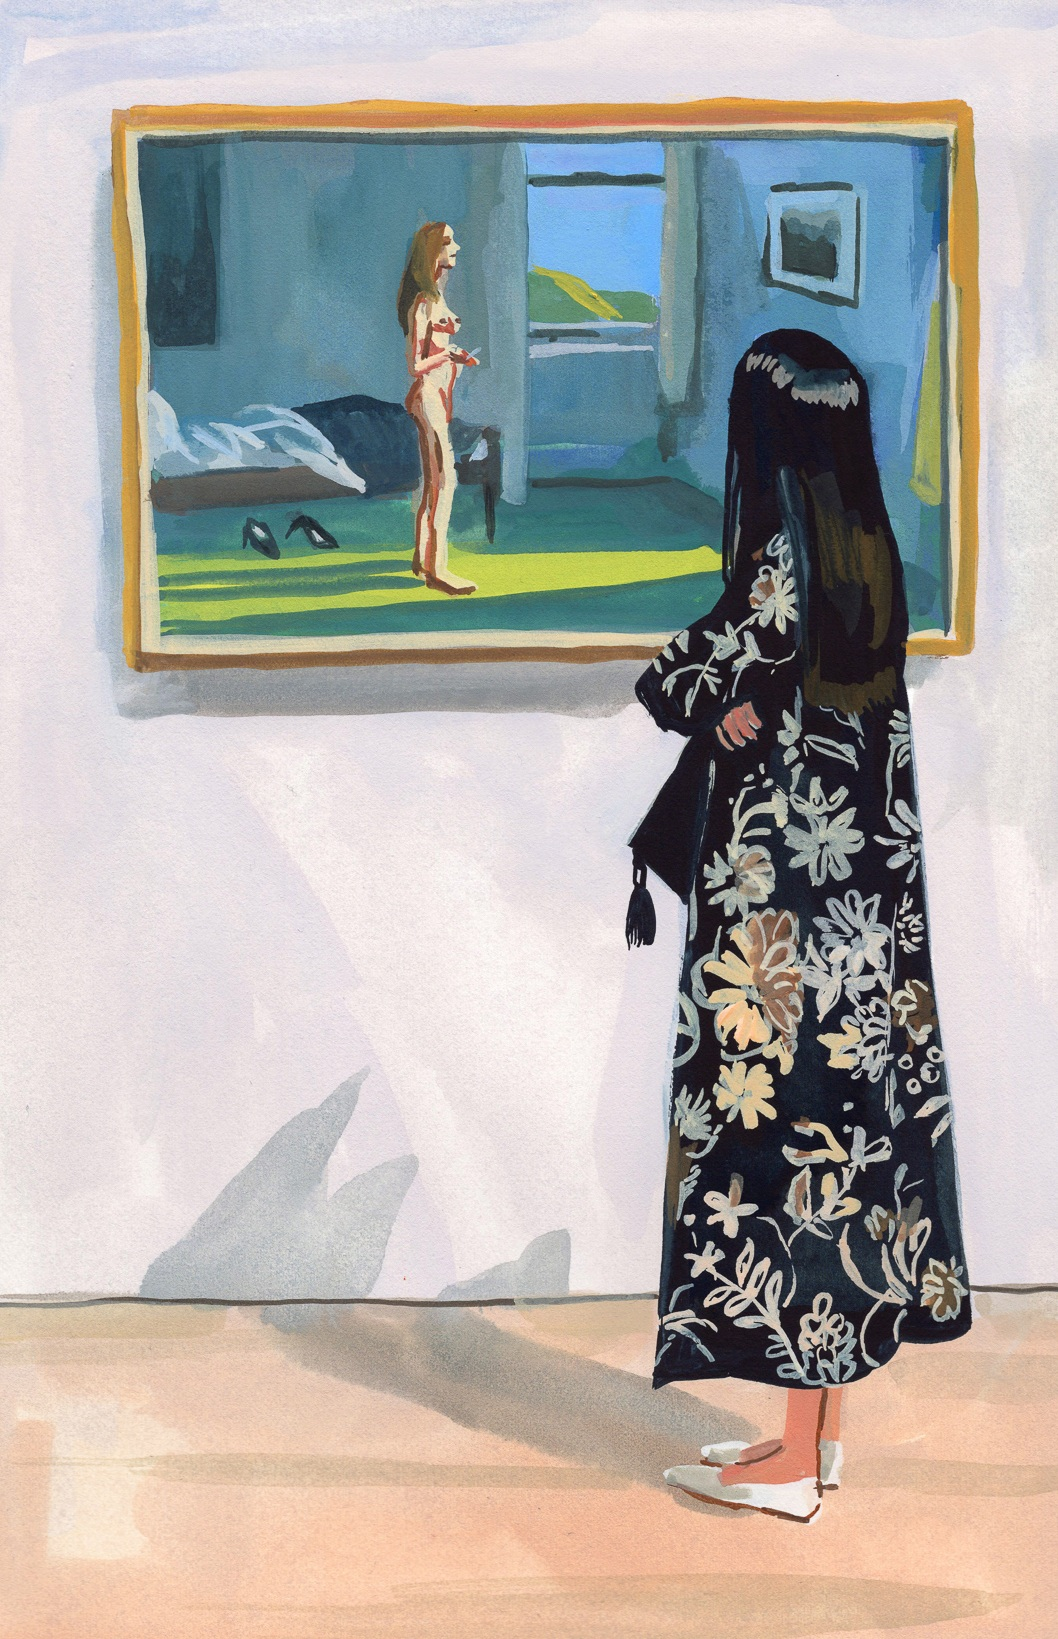 SOI 61 2018 - ARTIST: Jenny KroikTITLE: Hopper [Series, 6 of 6]